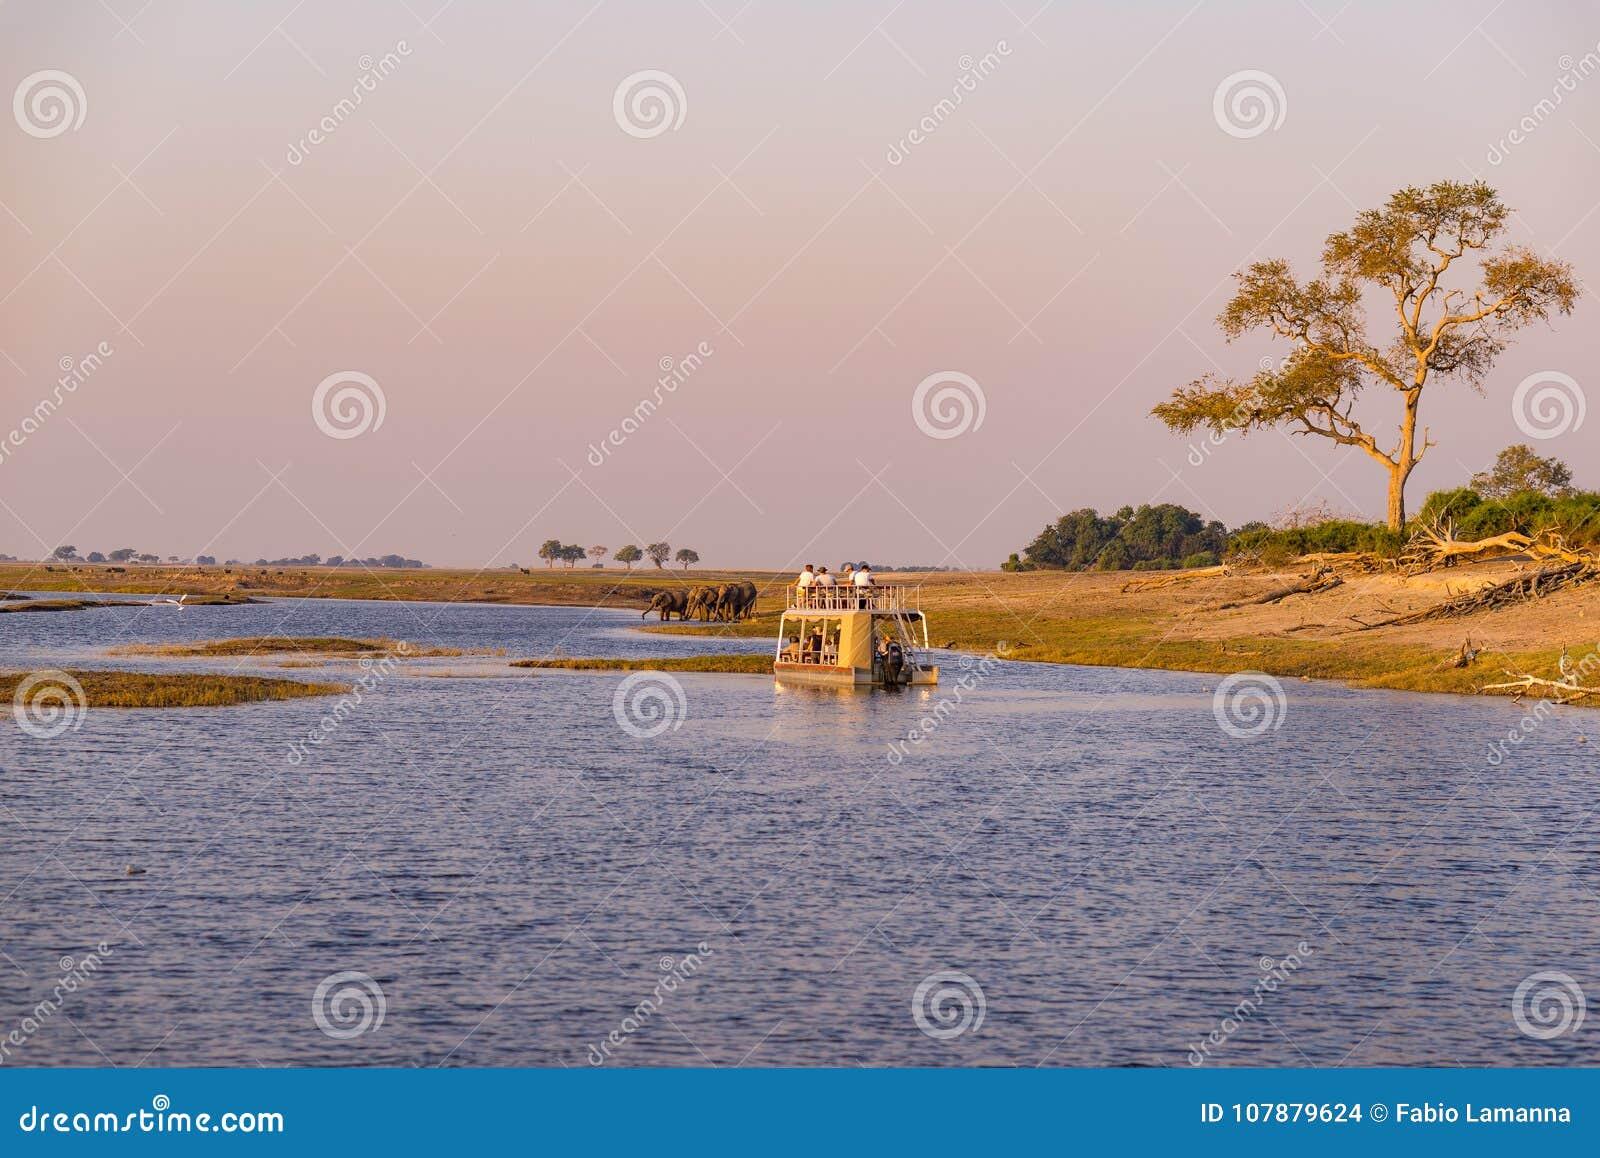 Bootskreuzfahrt und Safari der wild lebenden Tiere auf Chobe-Fluss, Namibia Botswana Grenze, Afrika Nationalpark Chobe, berühmte